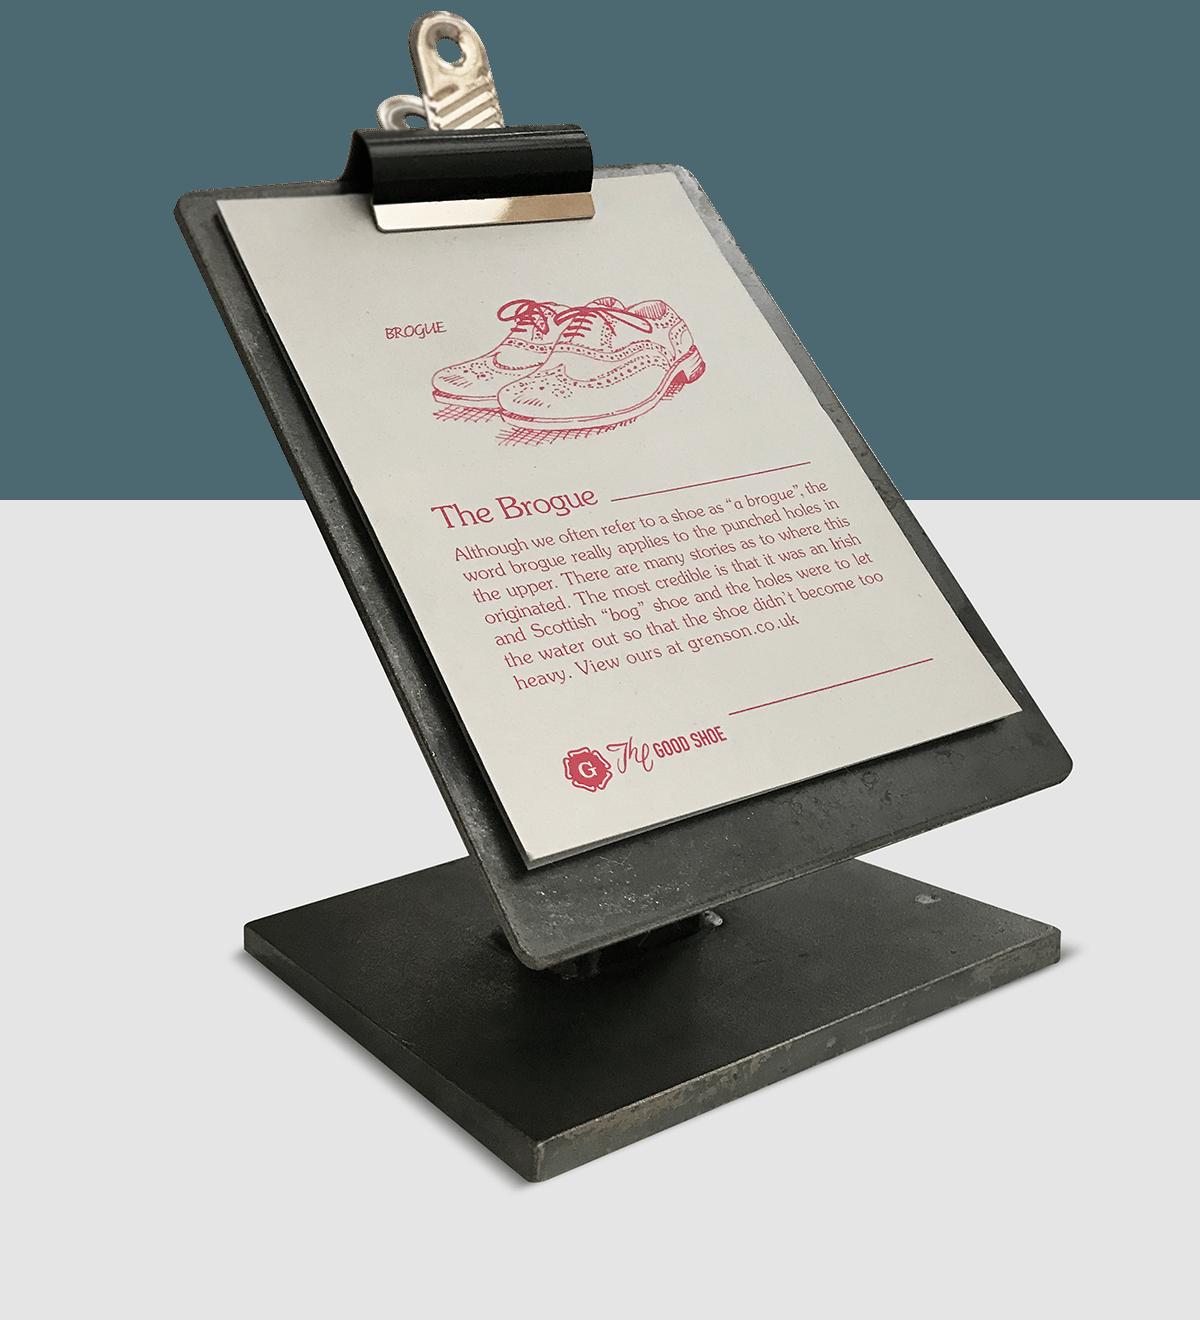 Grenson point of sale design